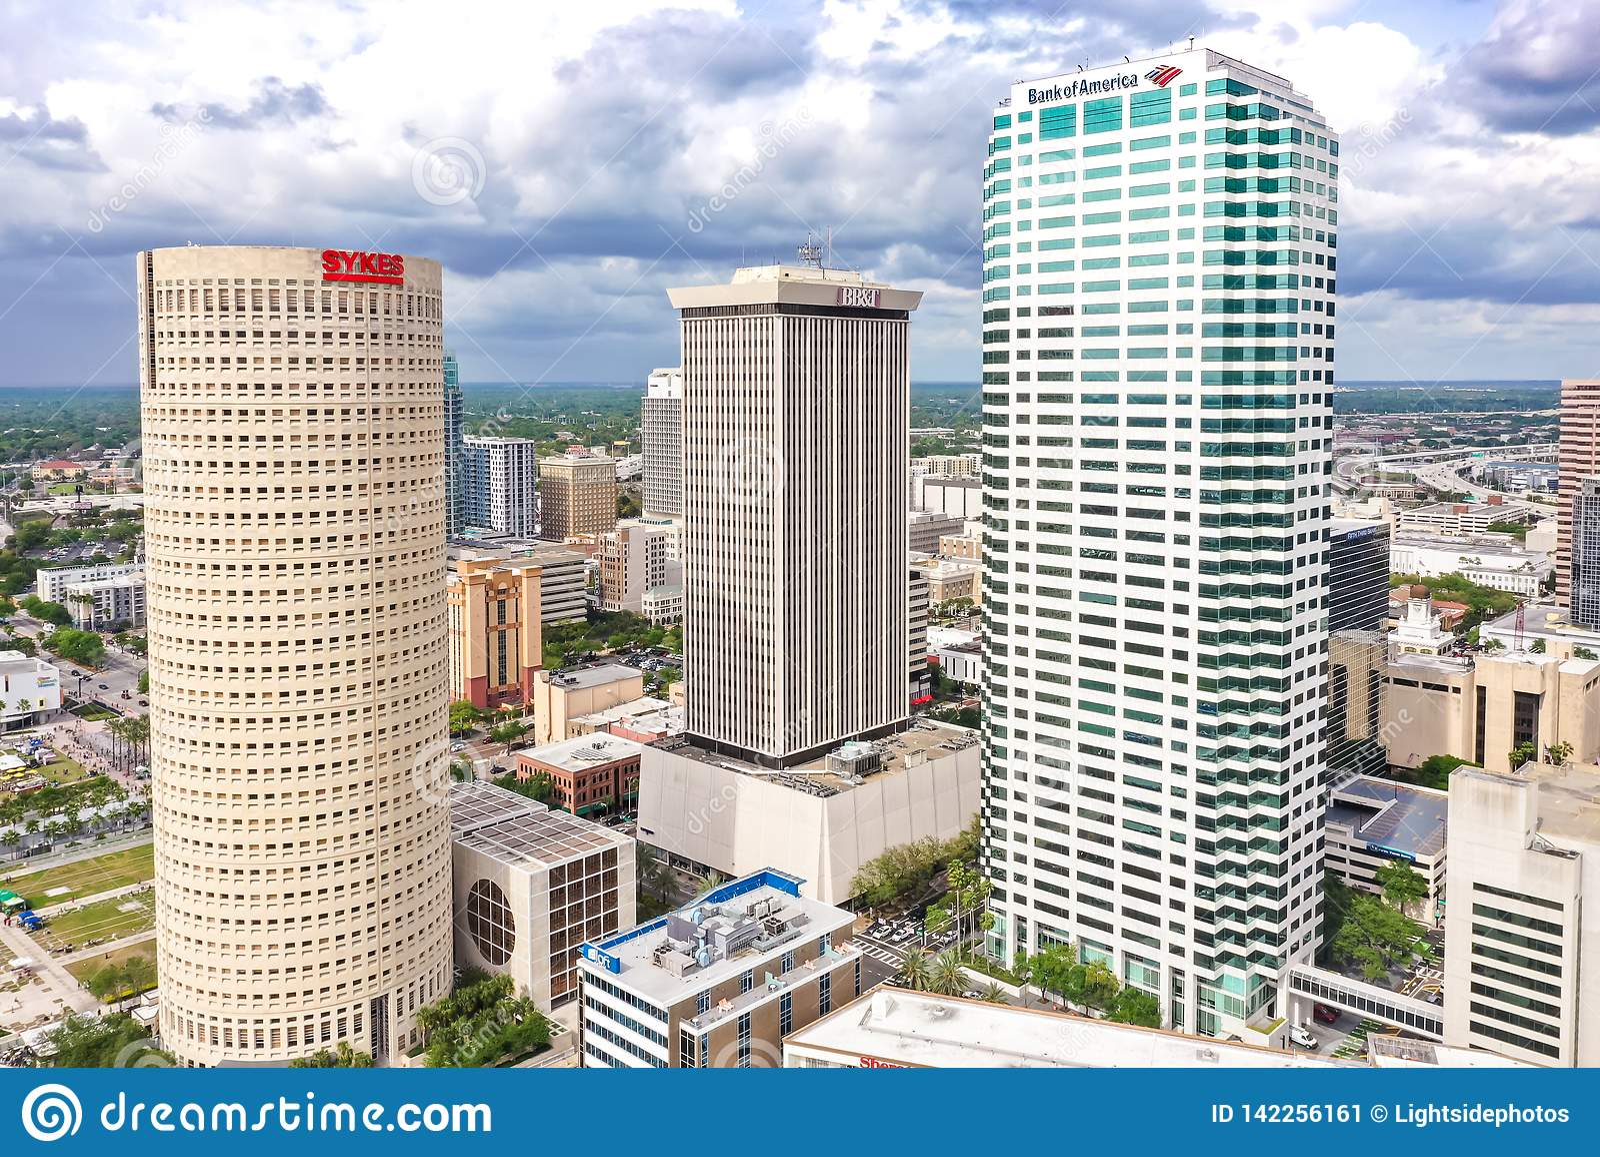 Tampa, Florida Downtown Skyline Skyscraper Aerial Photo